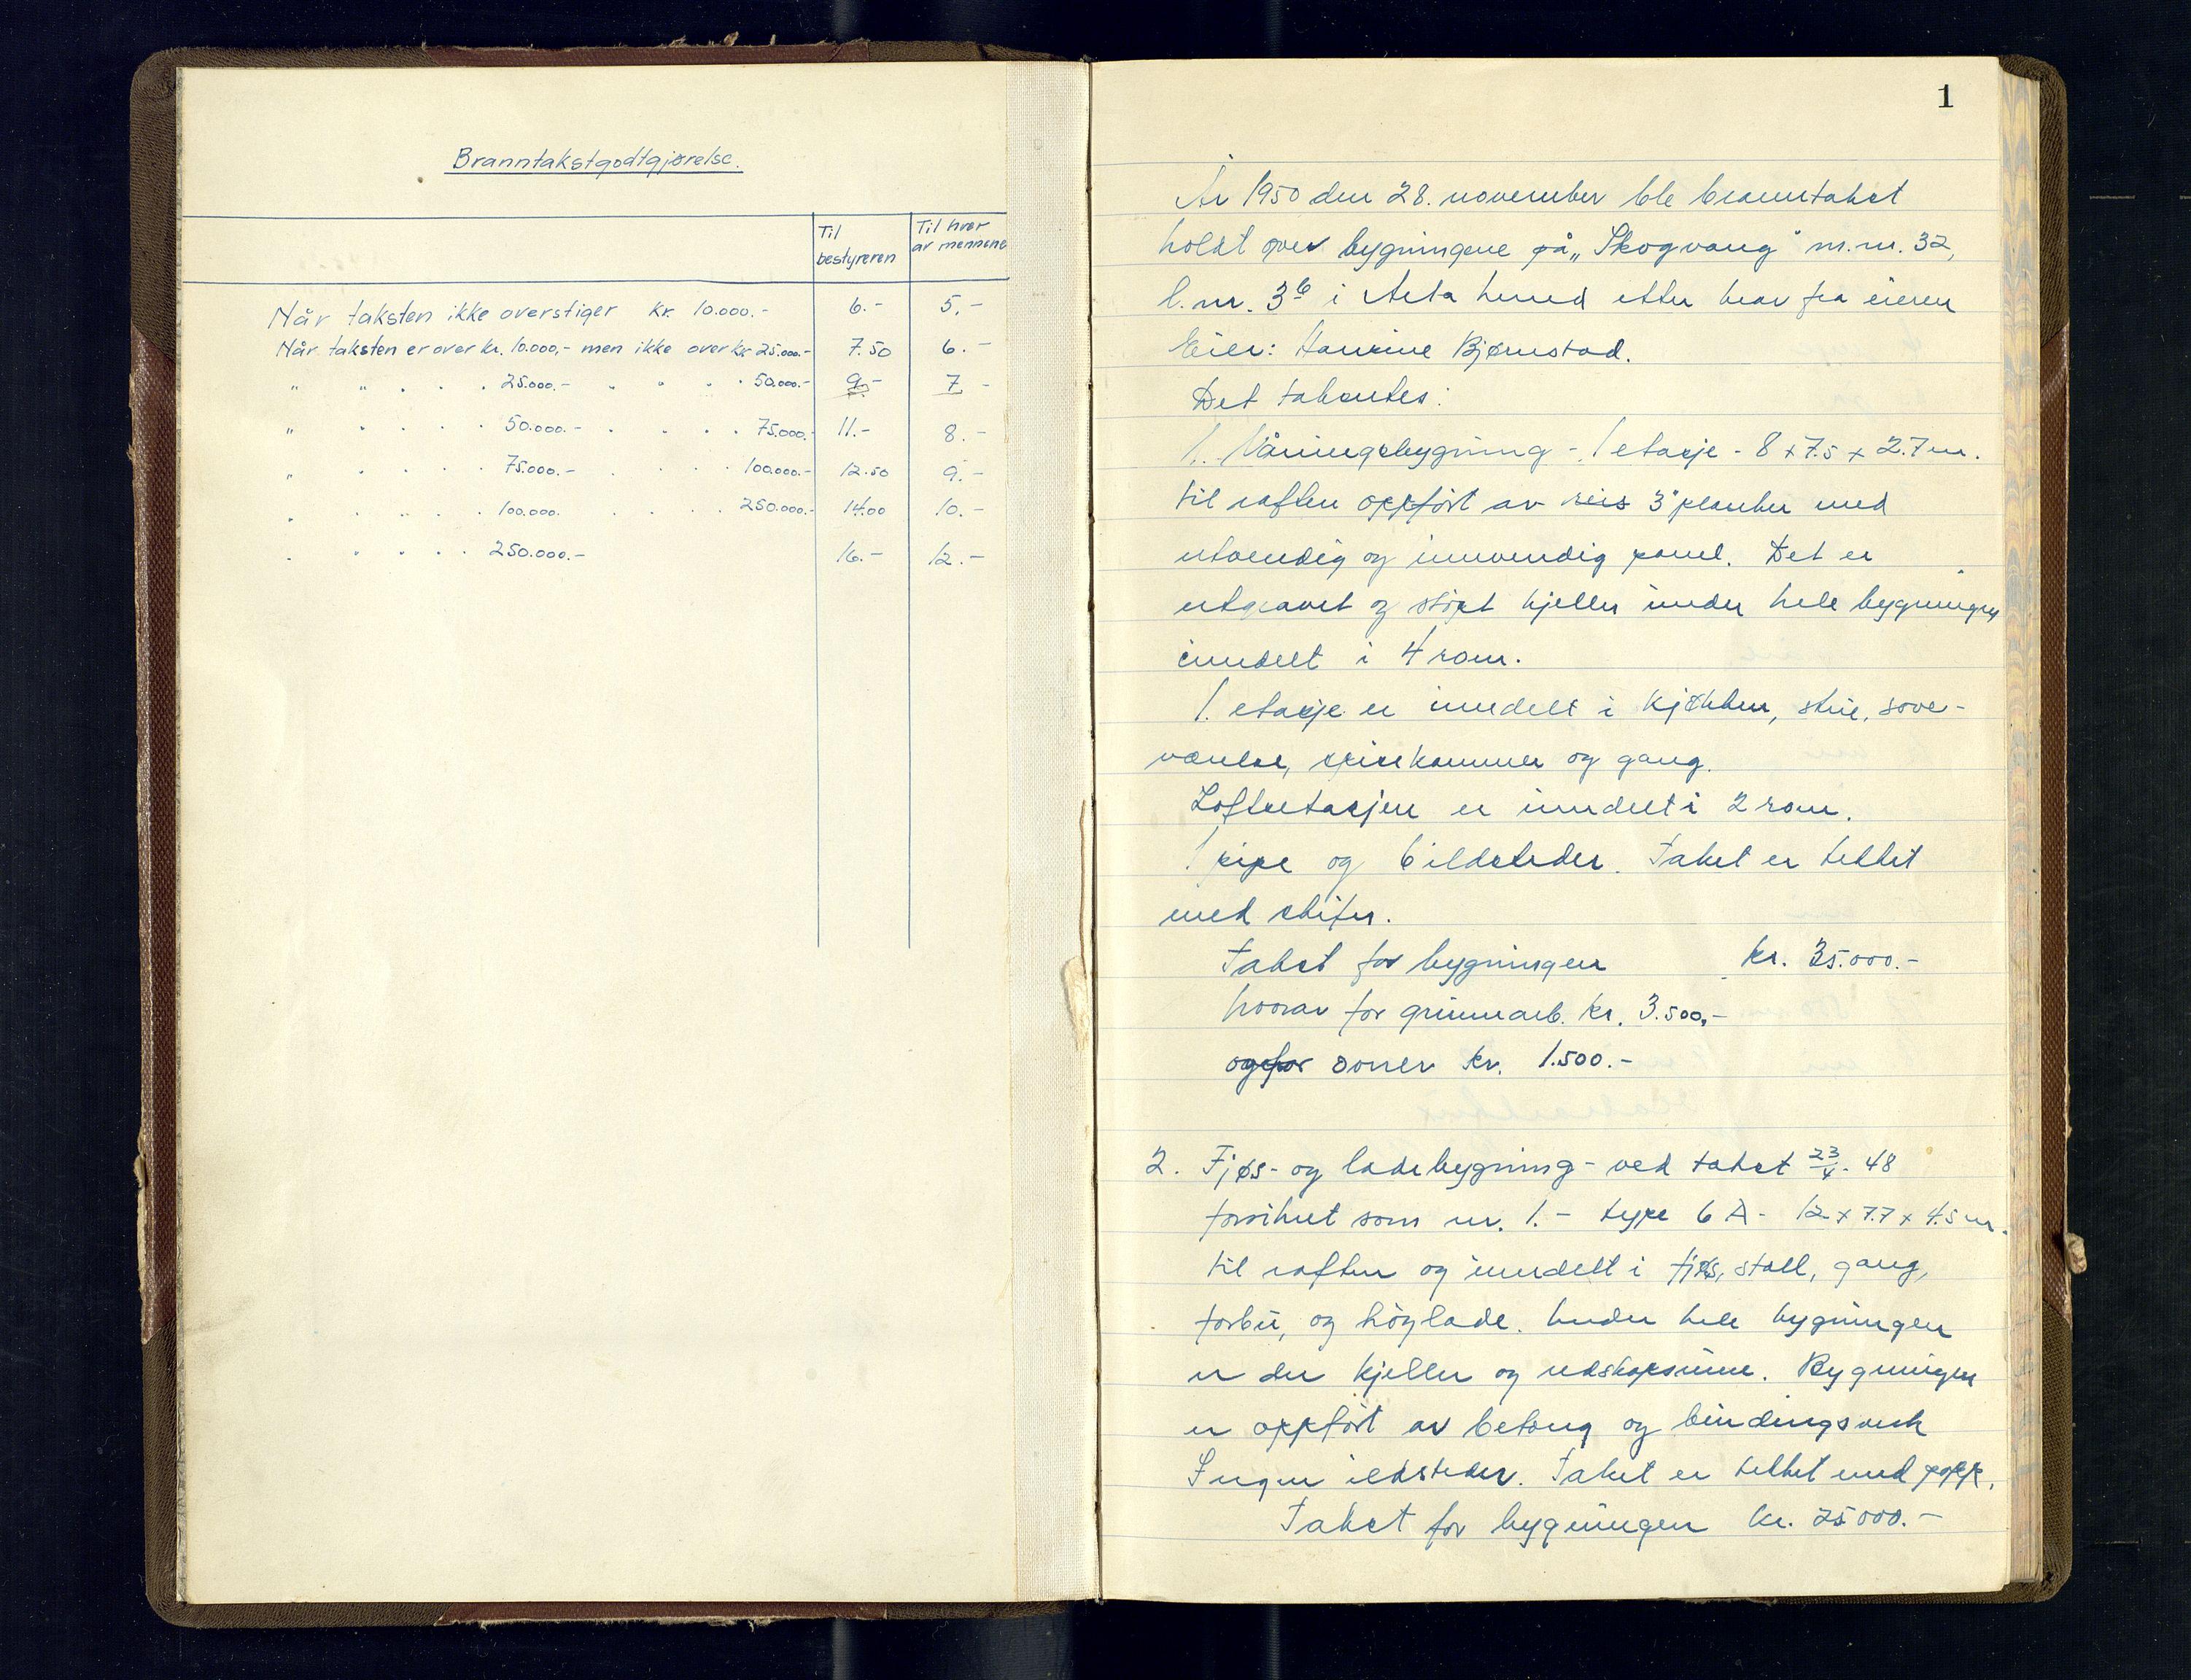 SATØ, Lensmannen i Alta, O/Ob/L0183: Branntakstprotokoll, 1950-1953, s. 1